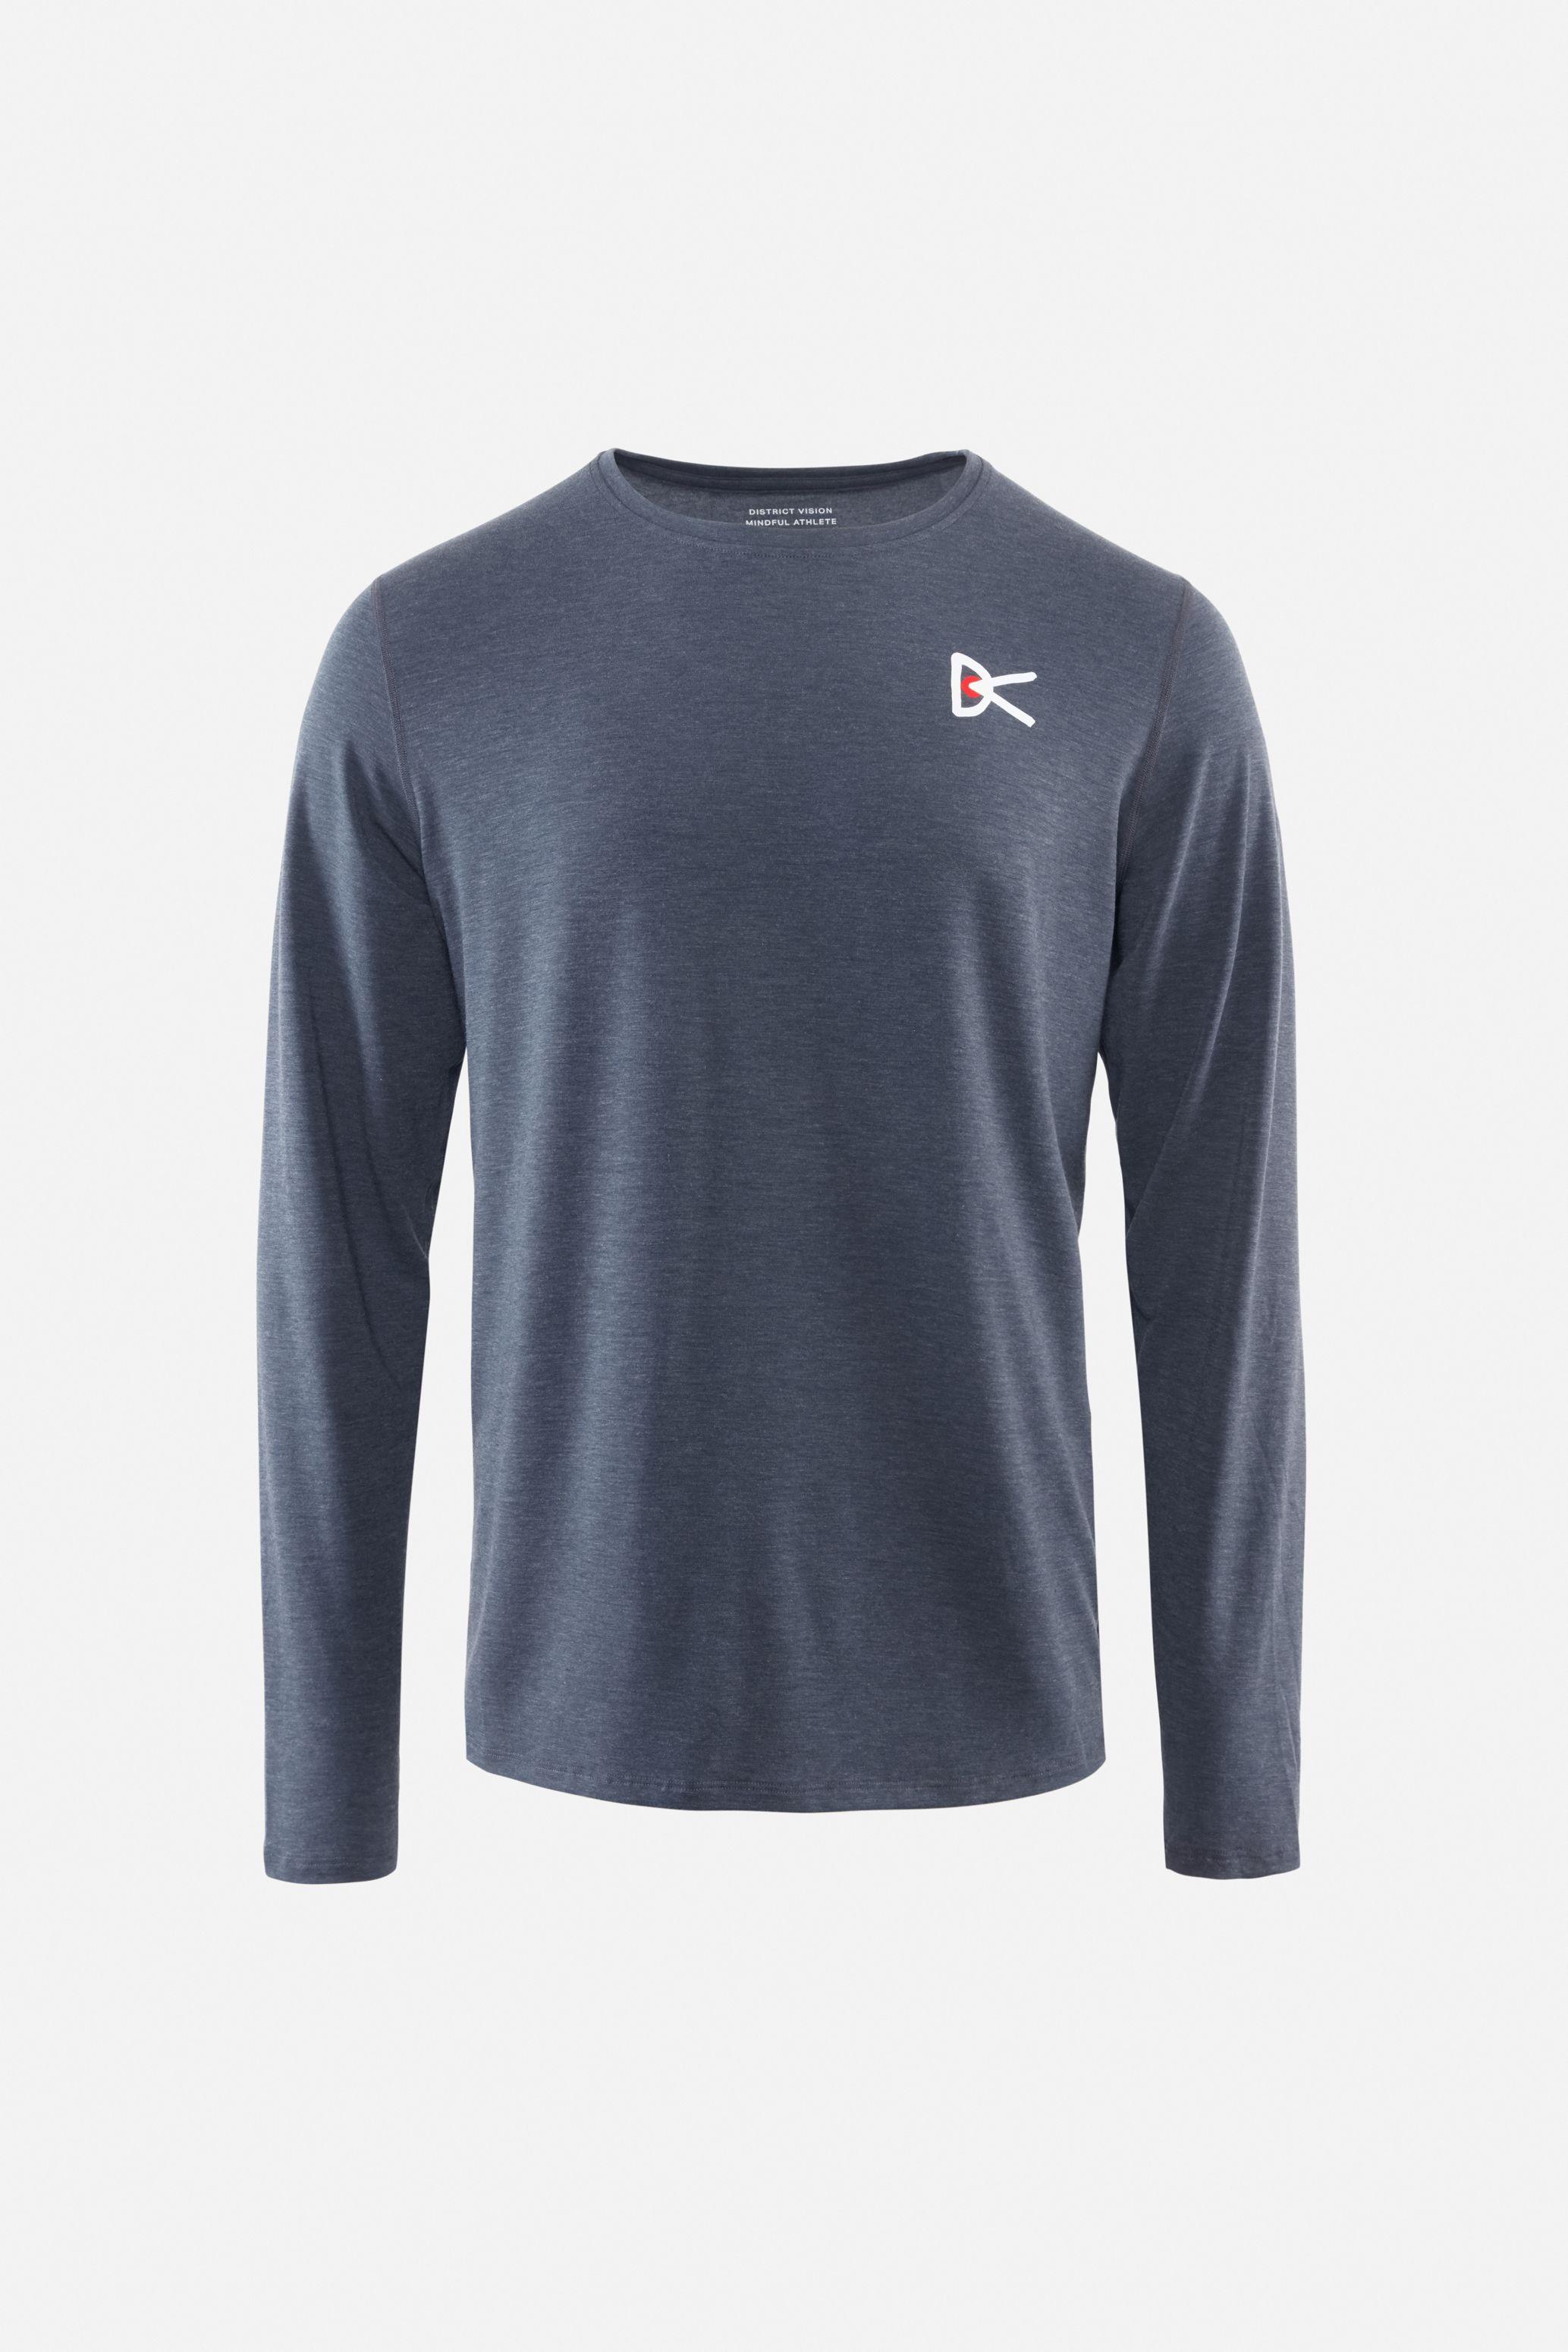 Tadasana Long Sleeve T-Shirt, Blue